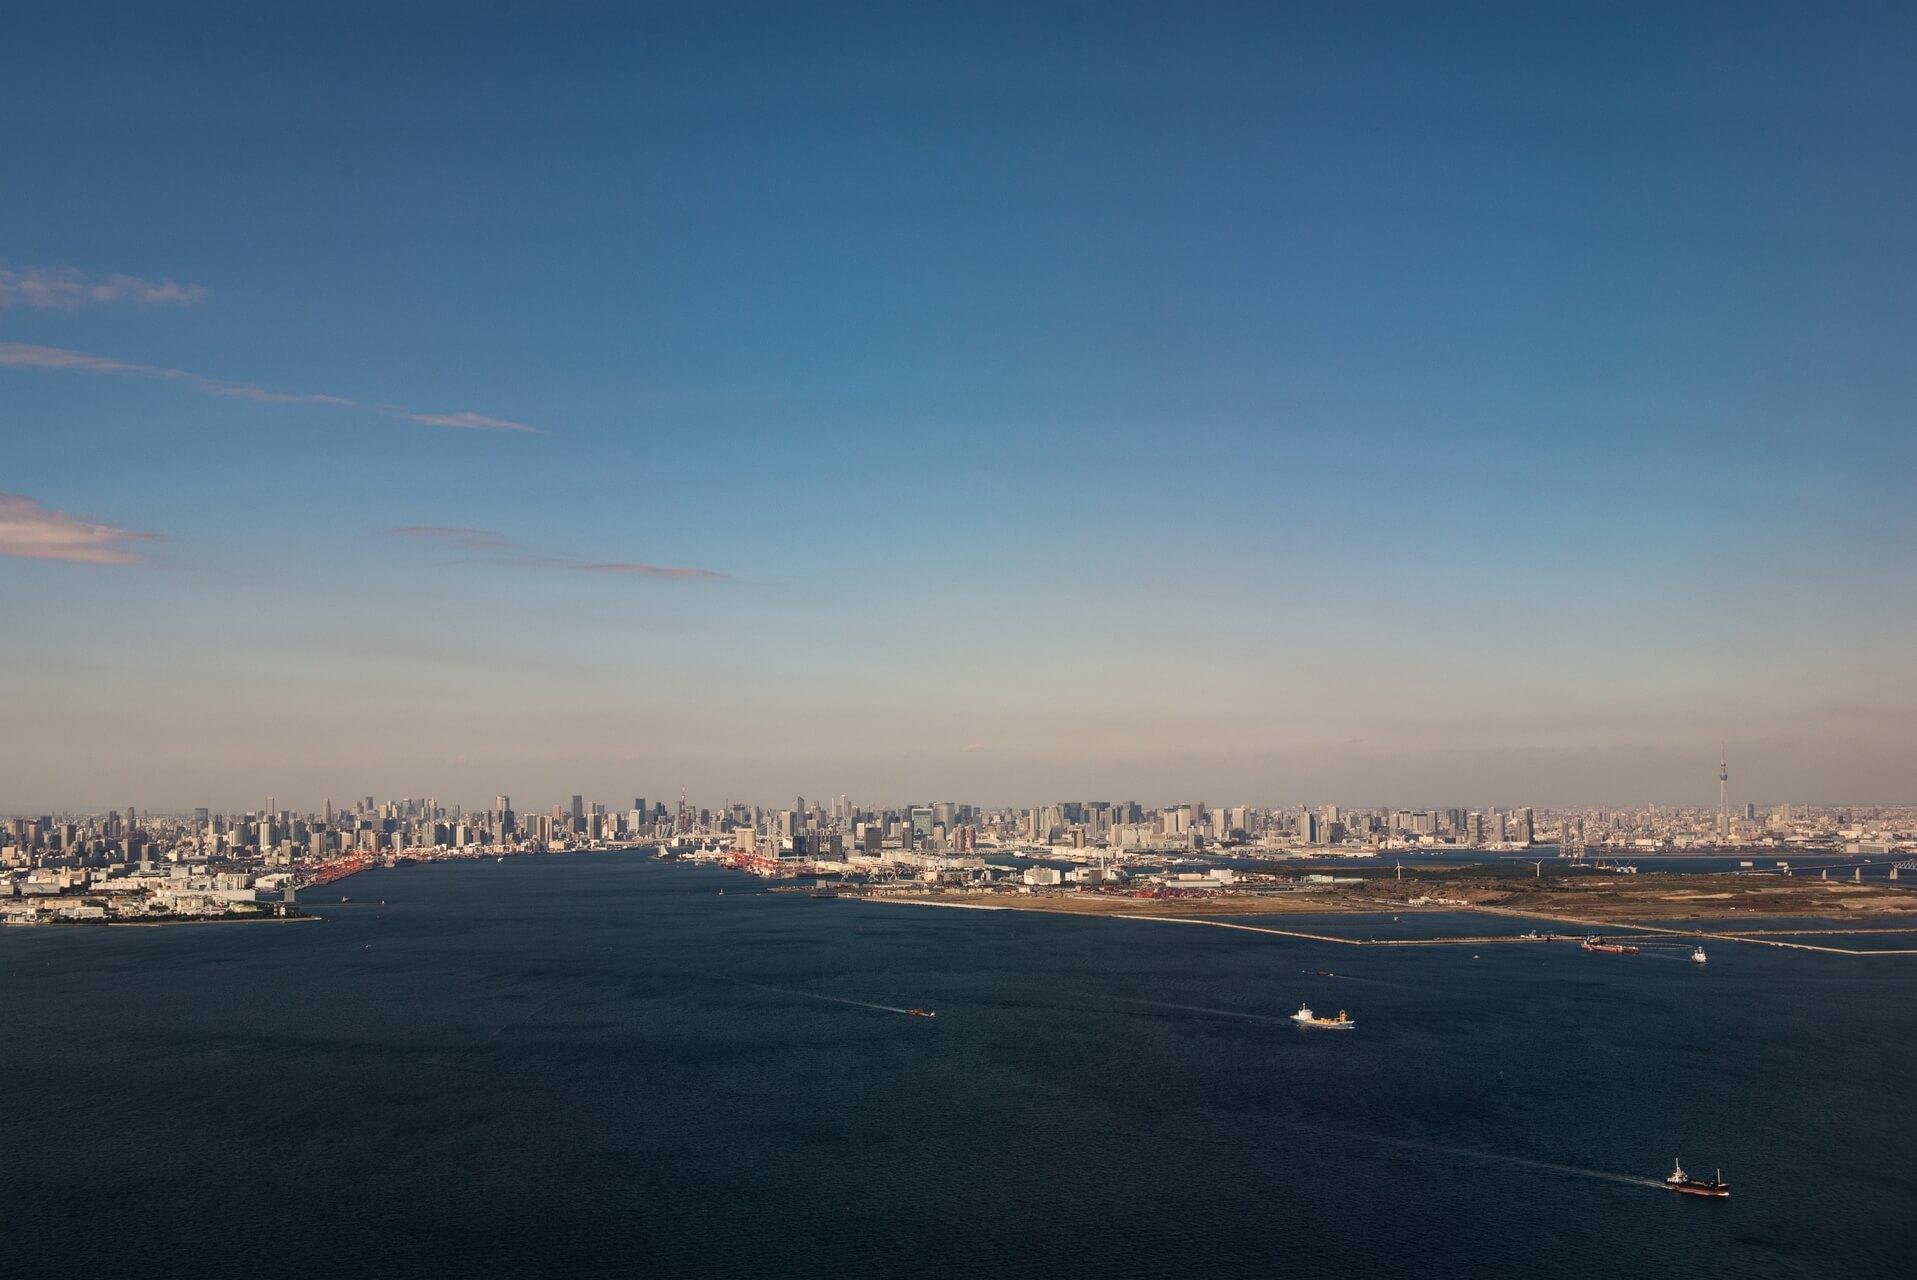 Japan: Tokyo Bay, Fotograf: Steffen Lohse